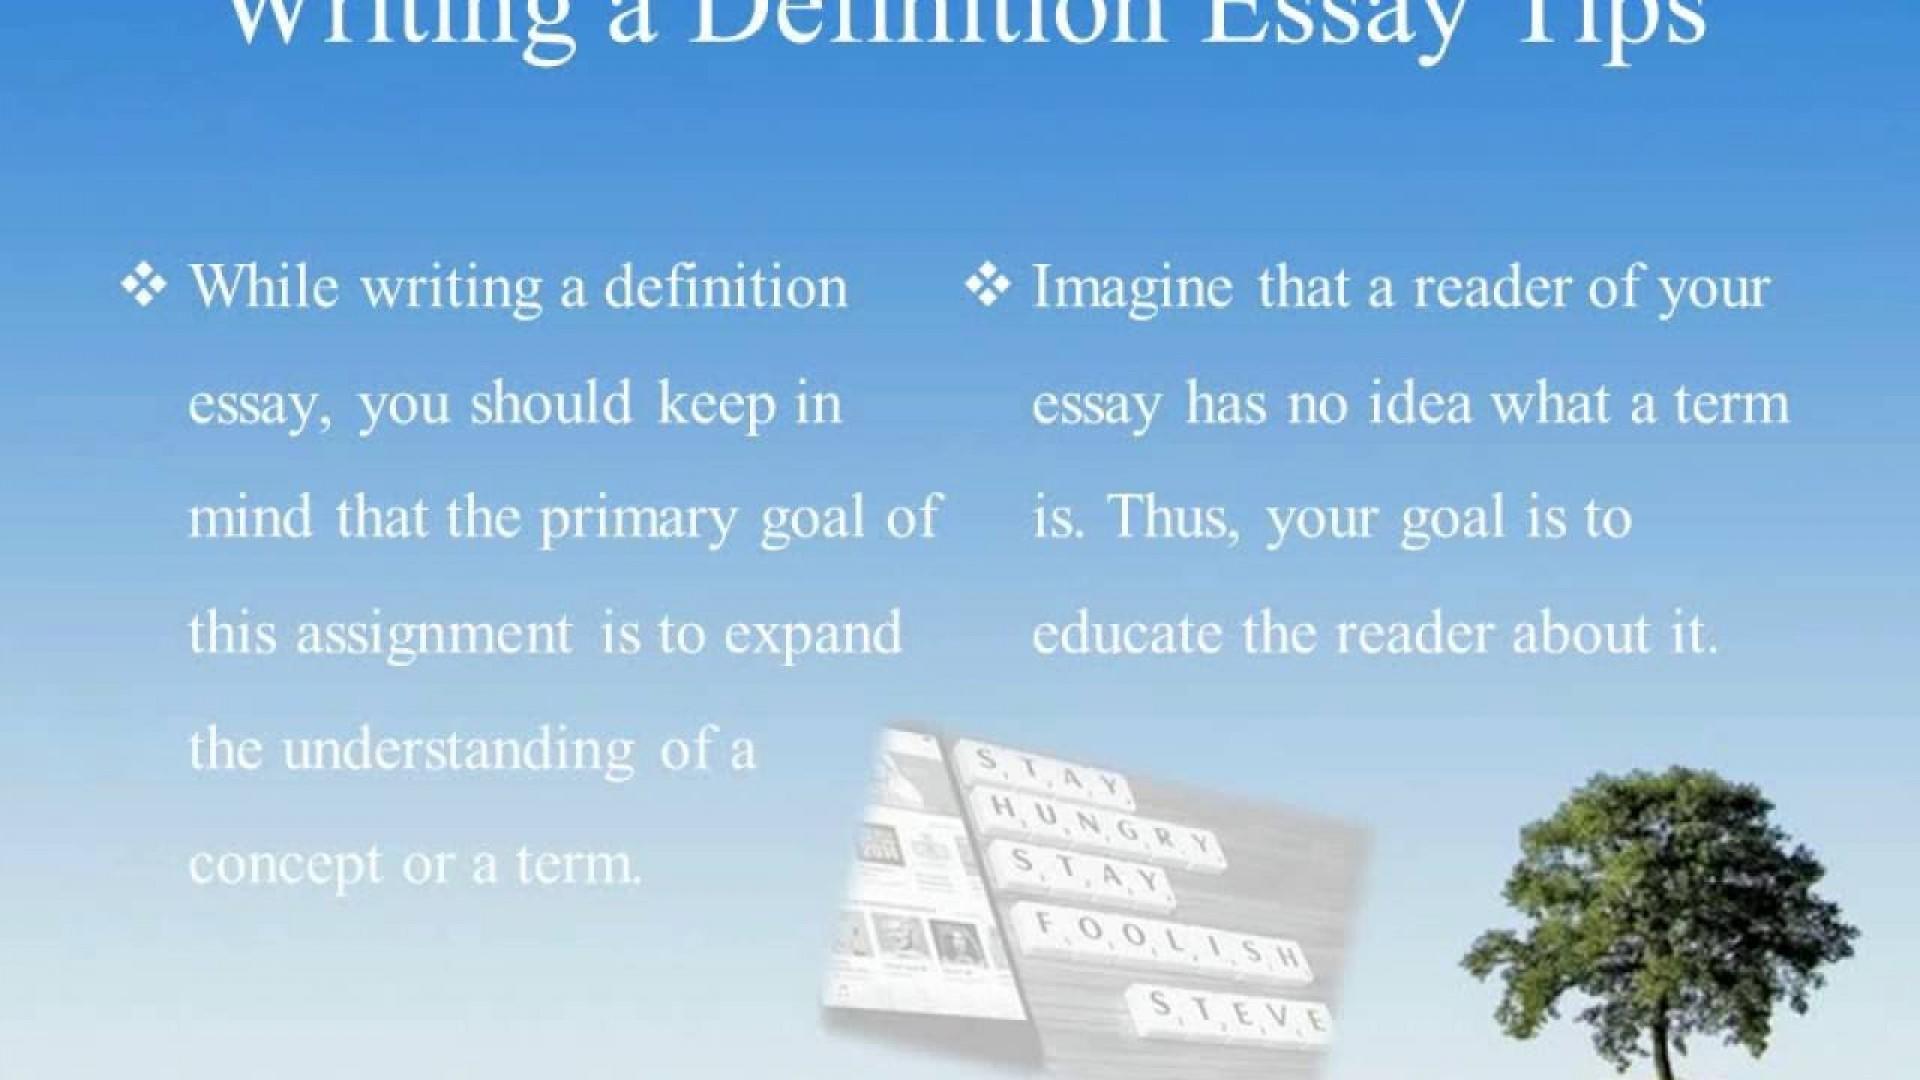 019 Definition Essay Topics Maxresdefault Striking For High School Creative 1920